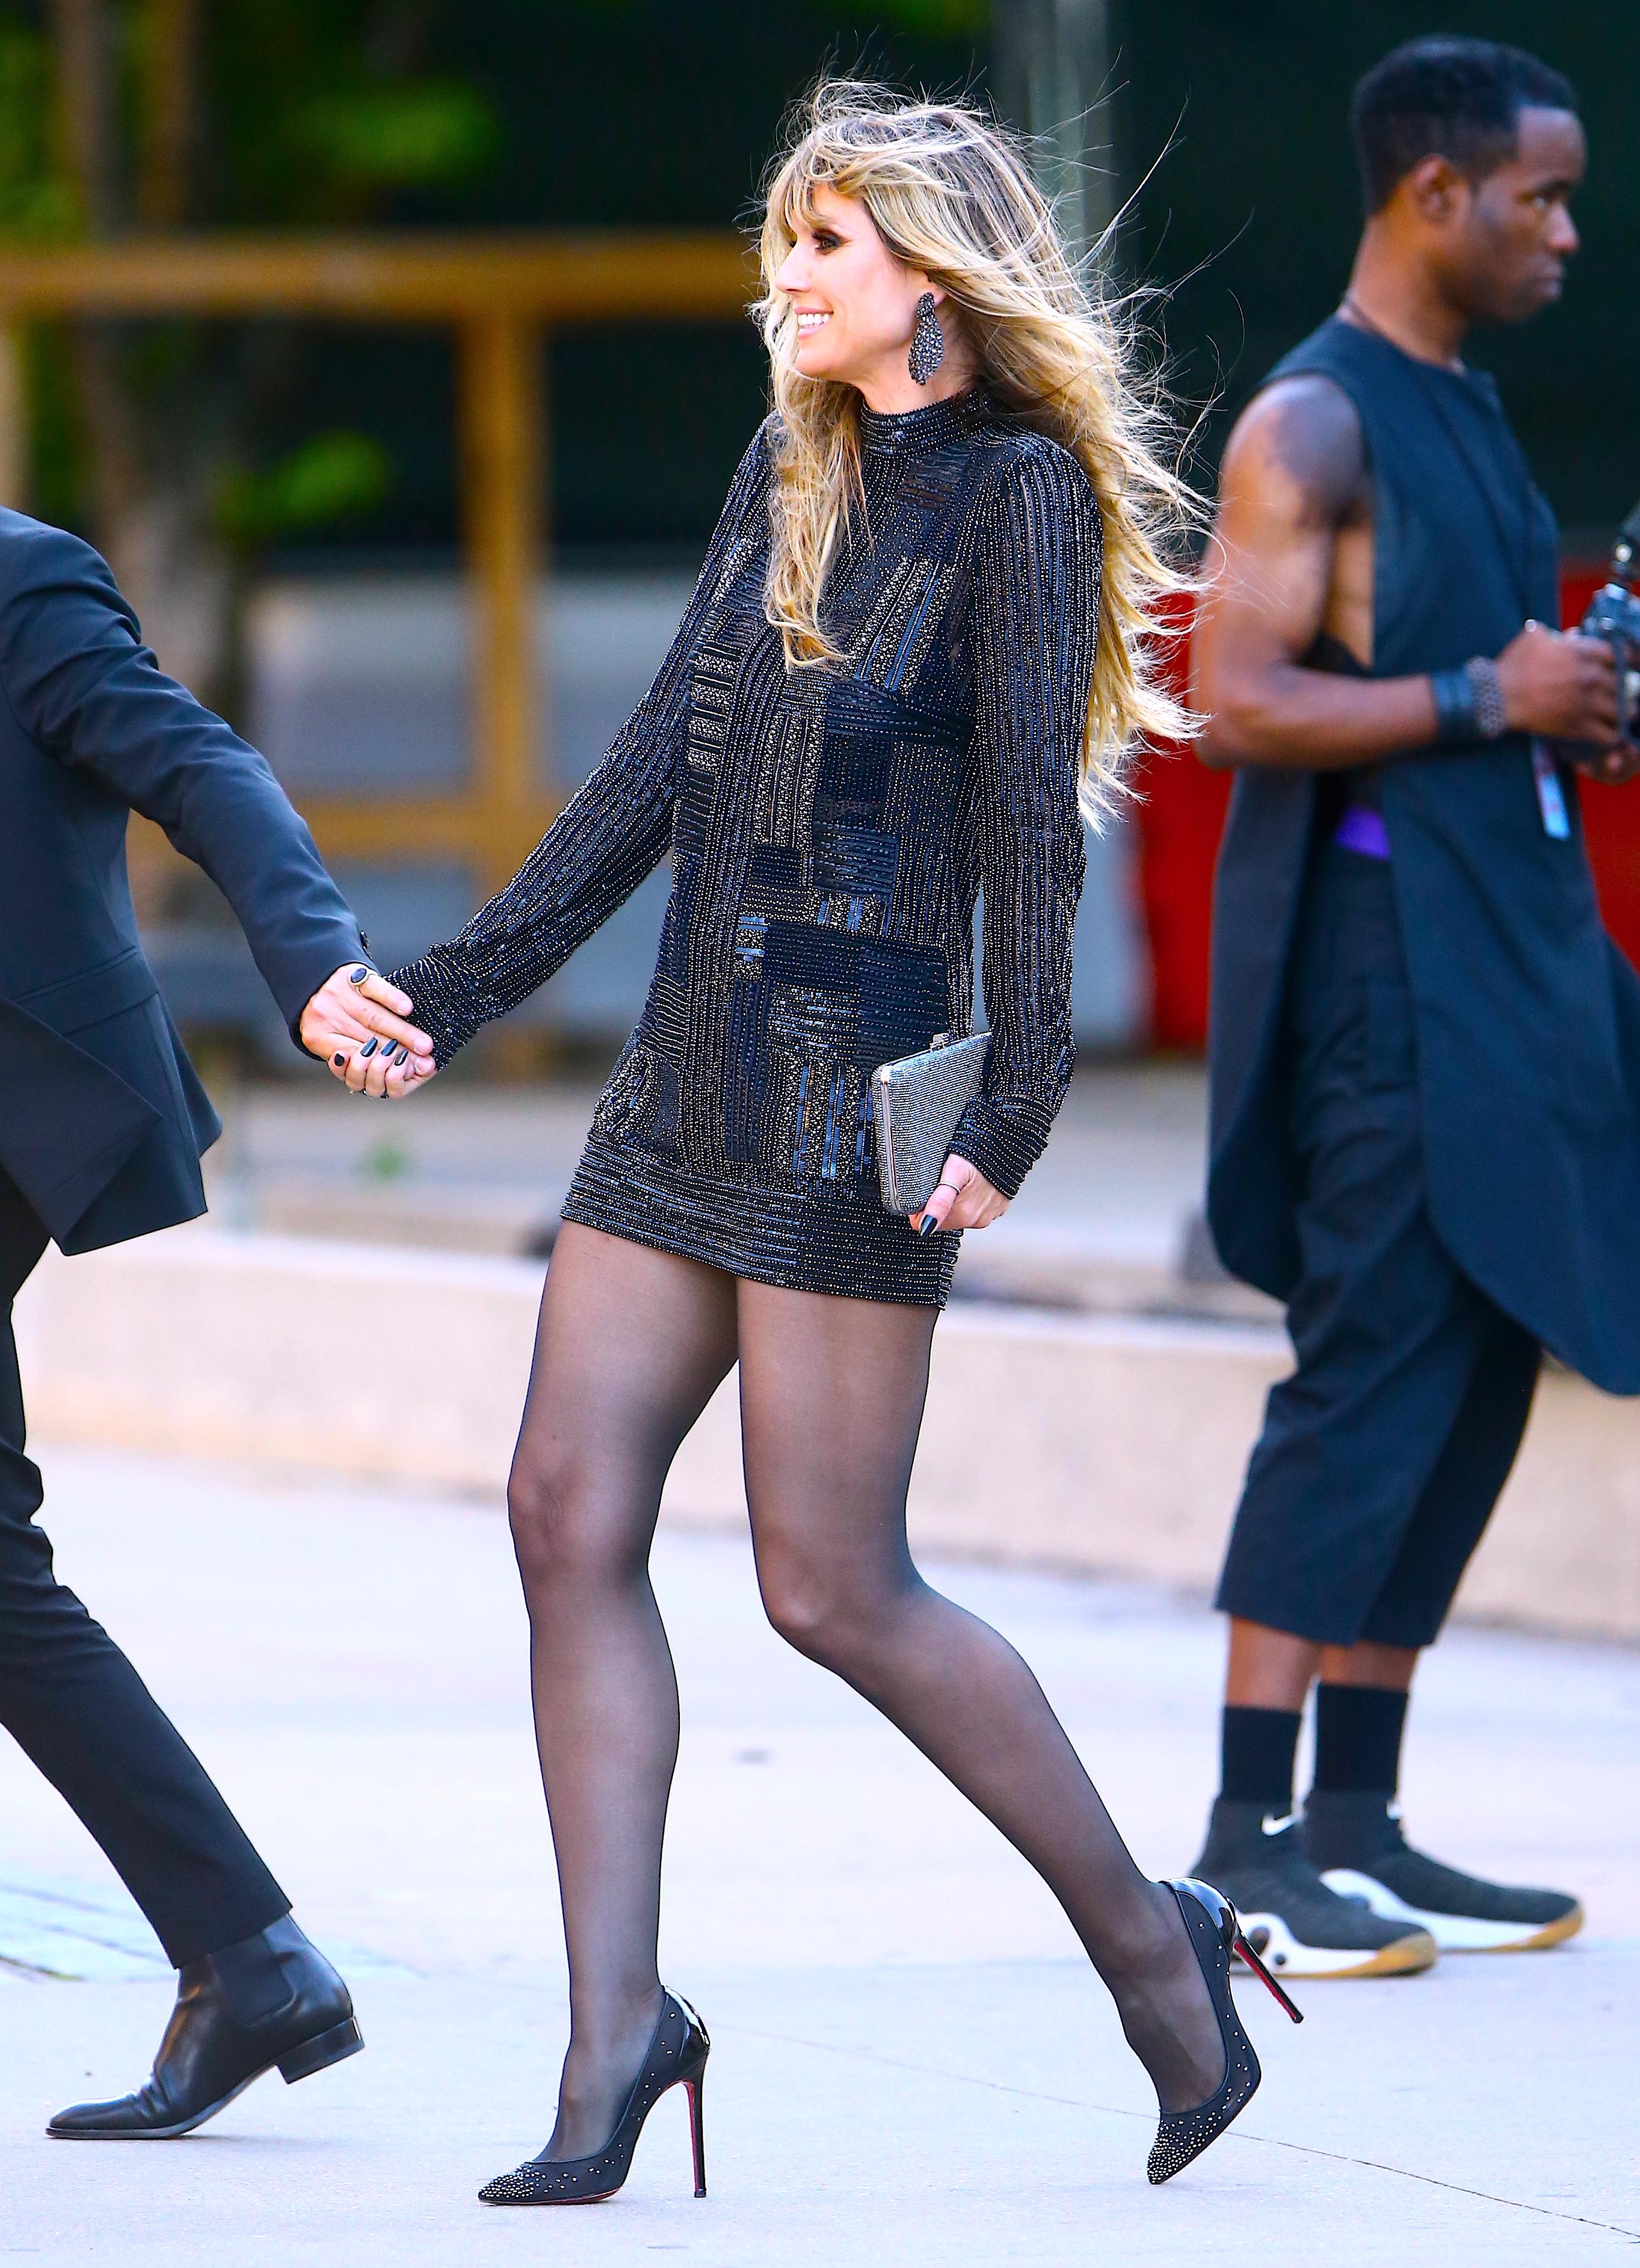 Legs heidi klum Heidi Klum